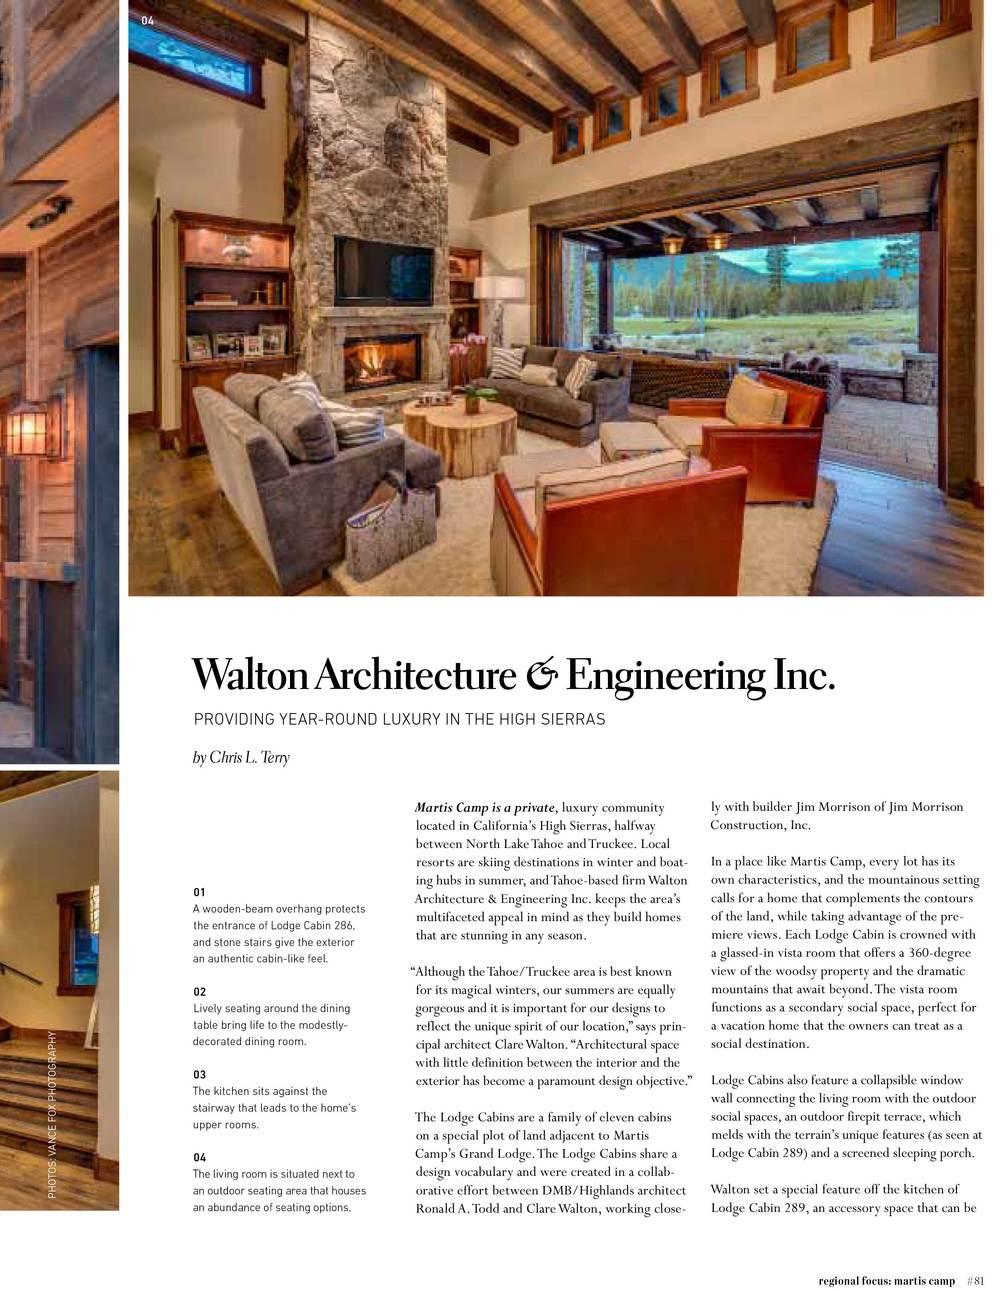 LHQ-Walton-Arch-+-Eng----Winter-2012-3.jpg